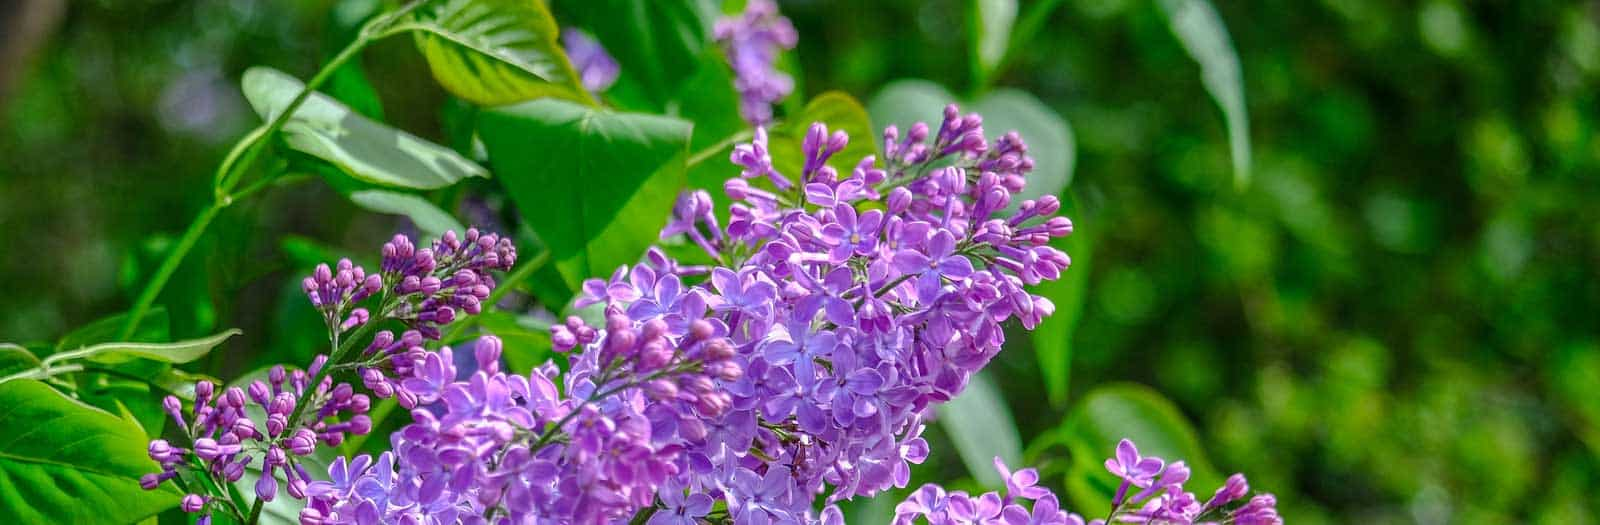 close up of a purple lilac shrub